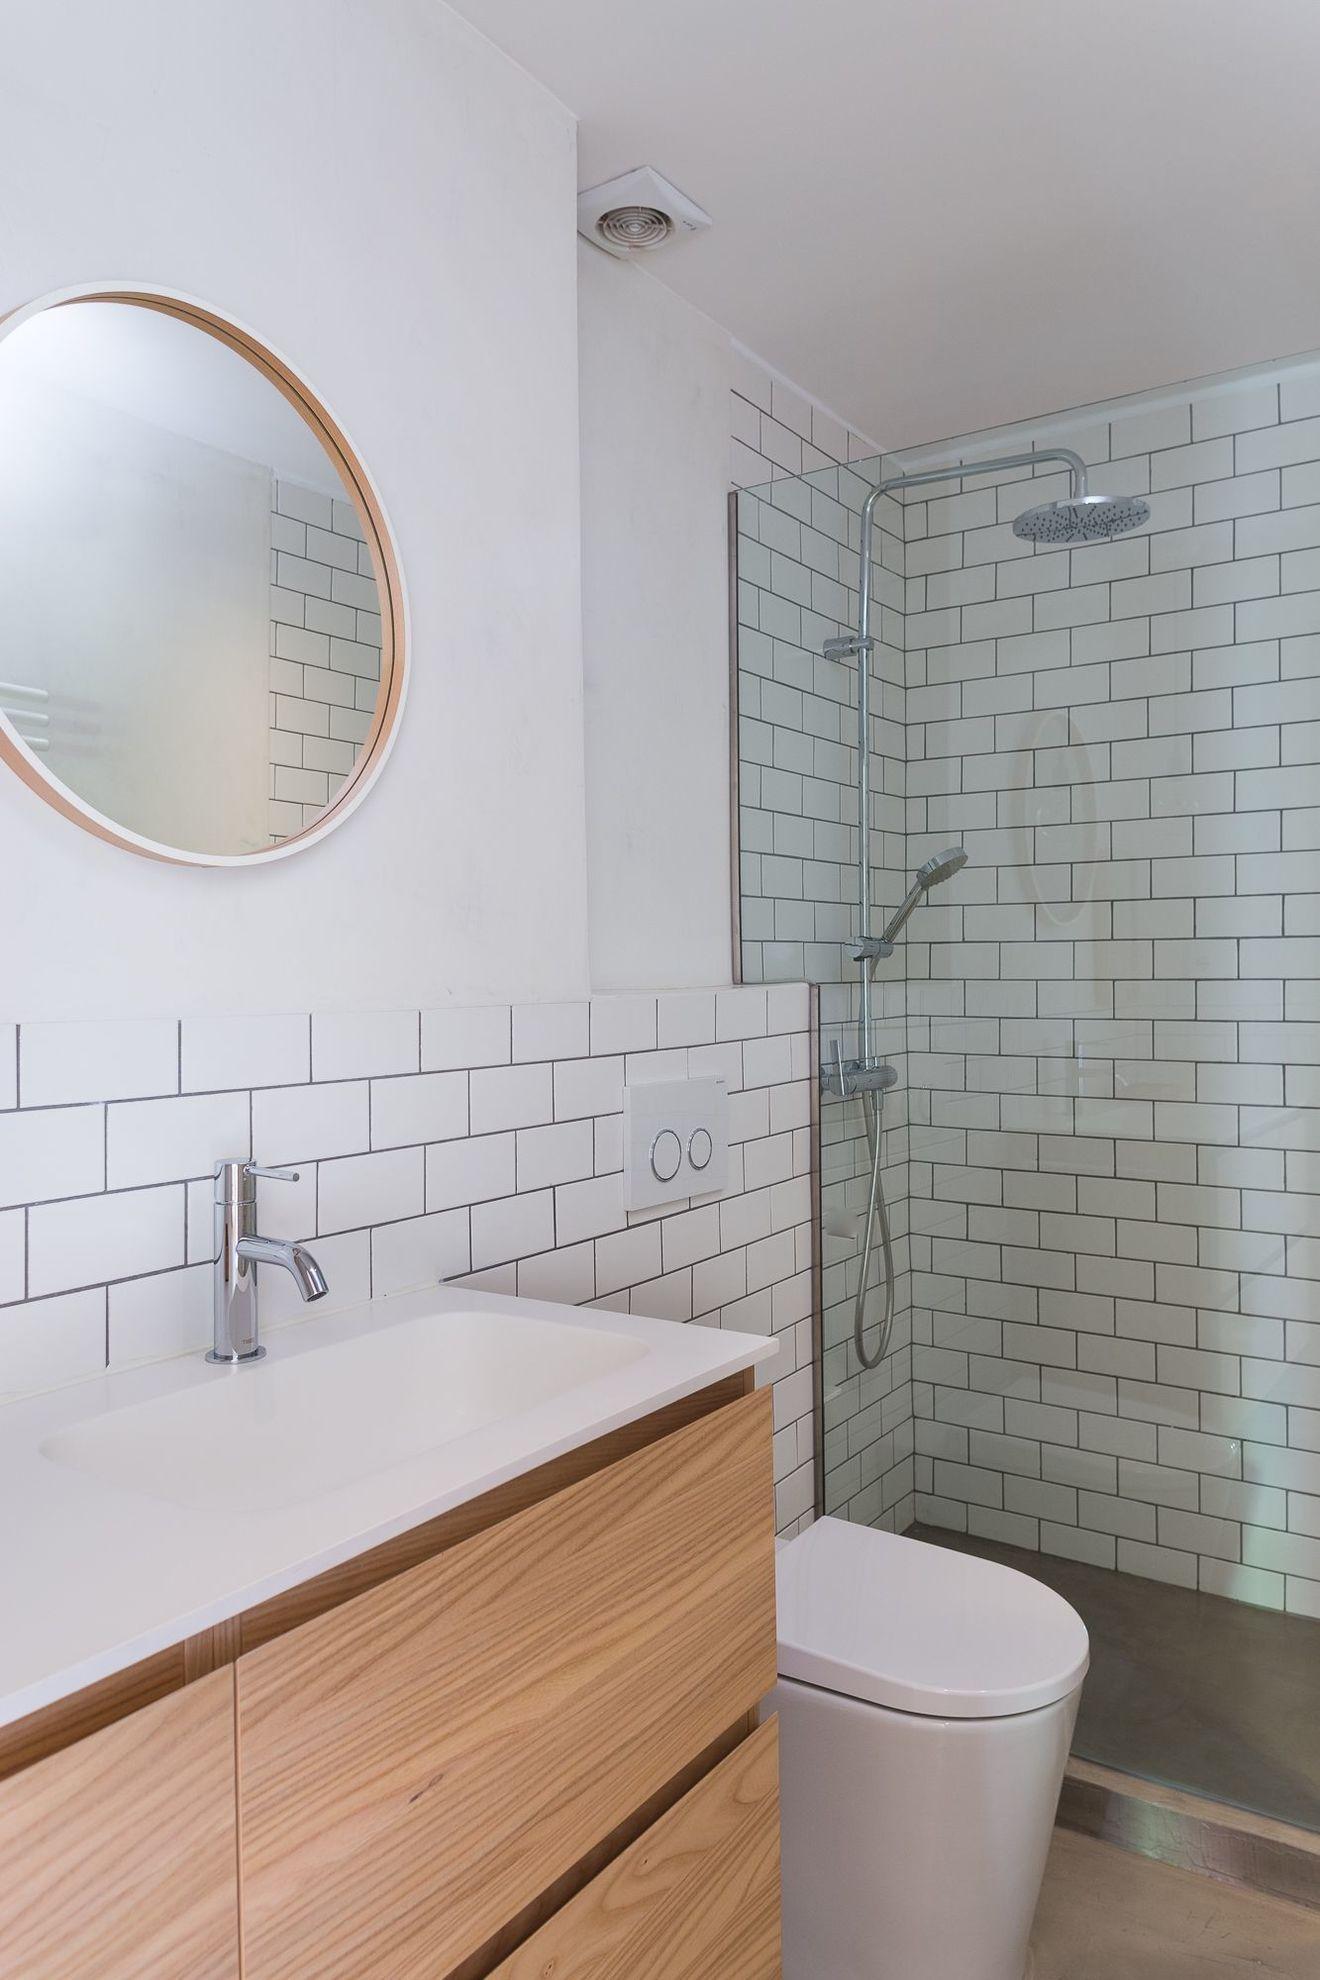 Avec Bains Salle Salle De Bains Avec Wc Cote Maison In 2020 Bathroom Mirror Bathroom